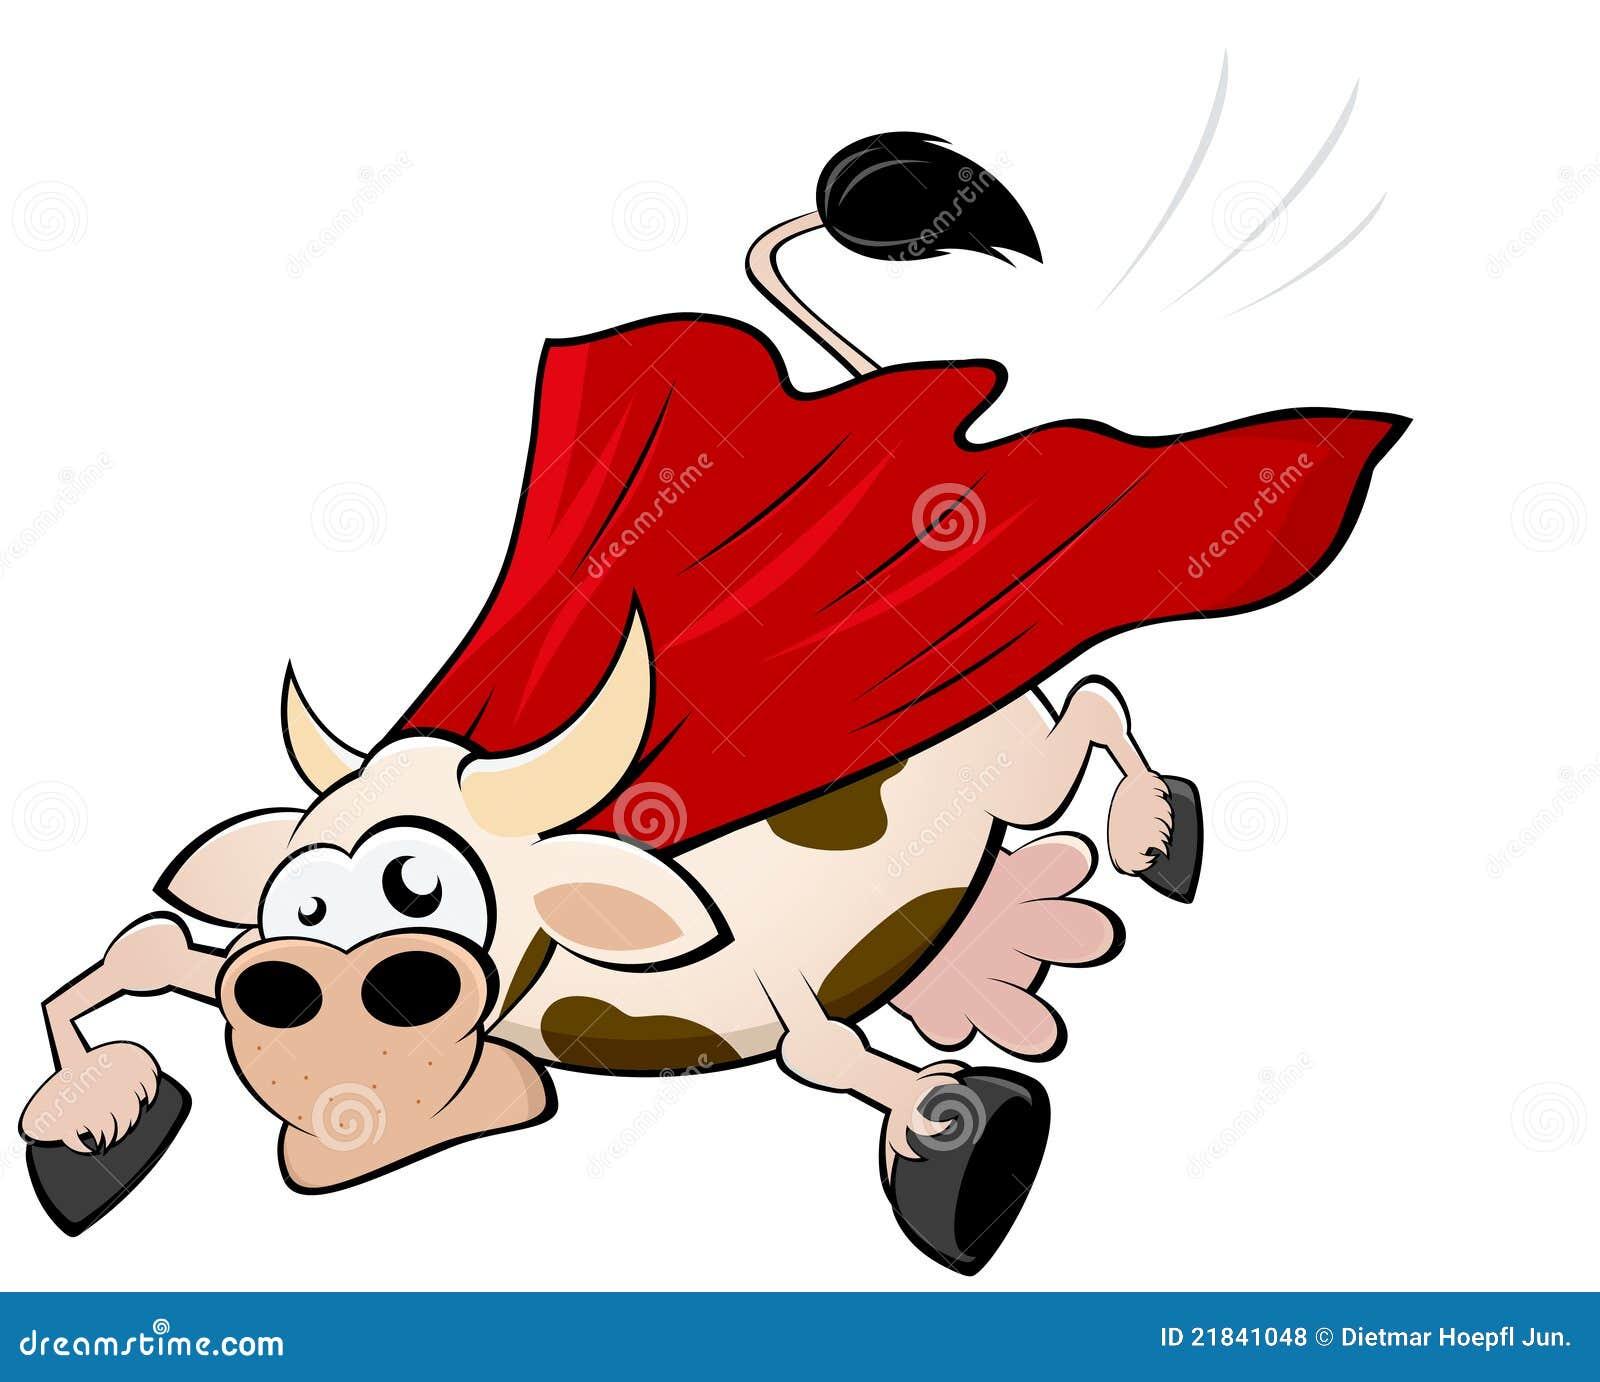 flying cow royalty free stock photos image 21841048 black girl superhero clipart girl superhero clip art free